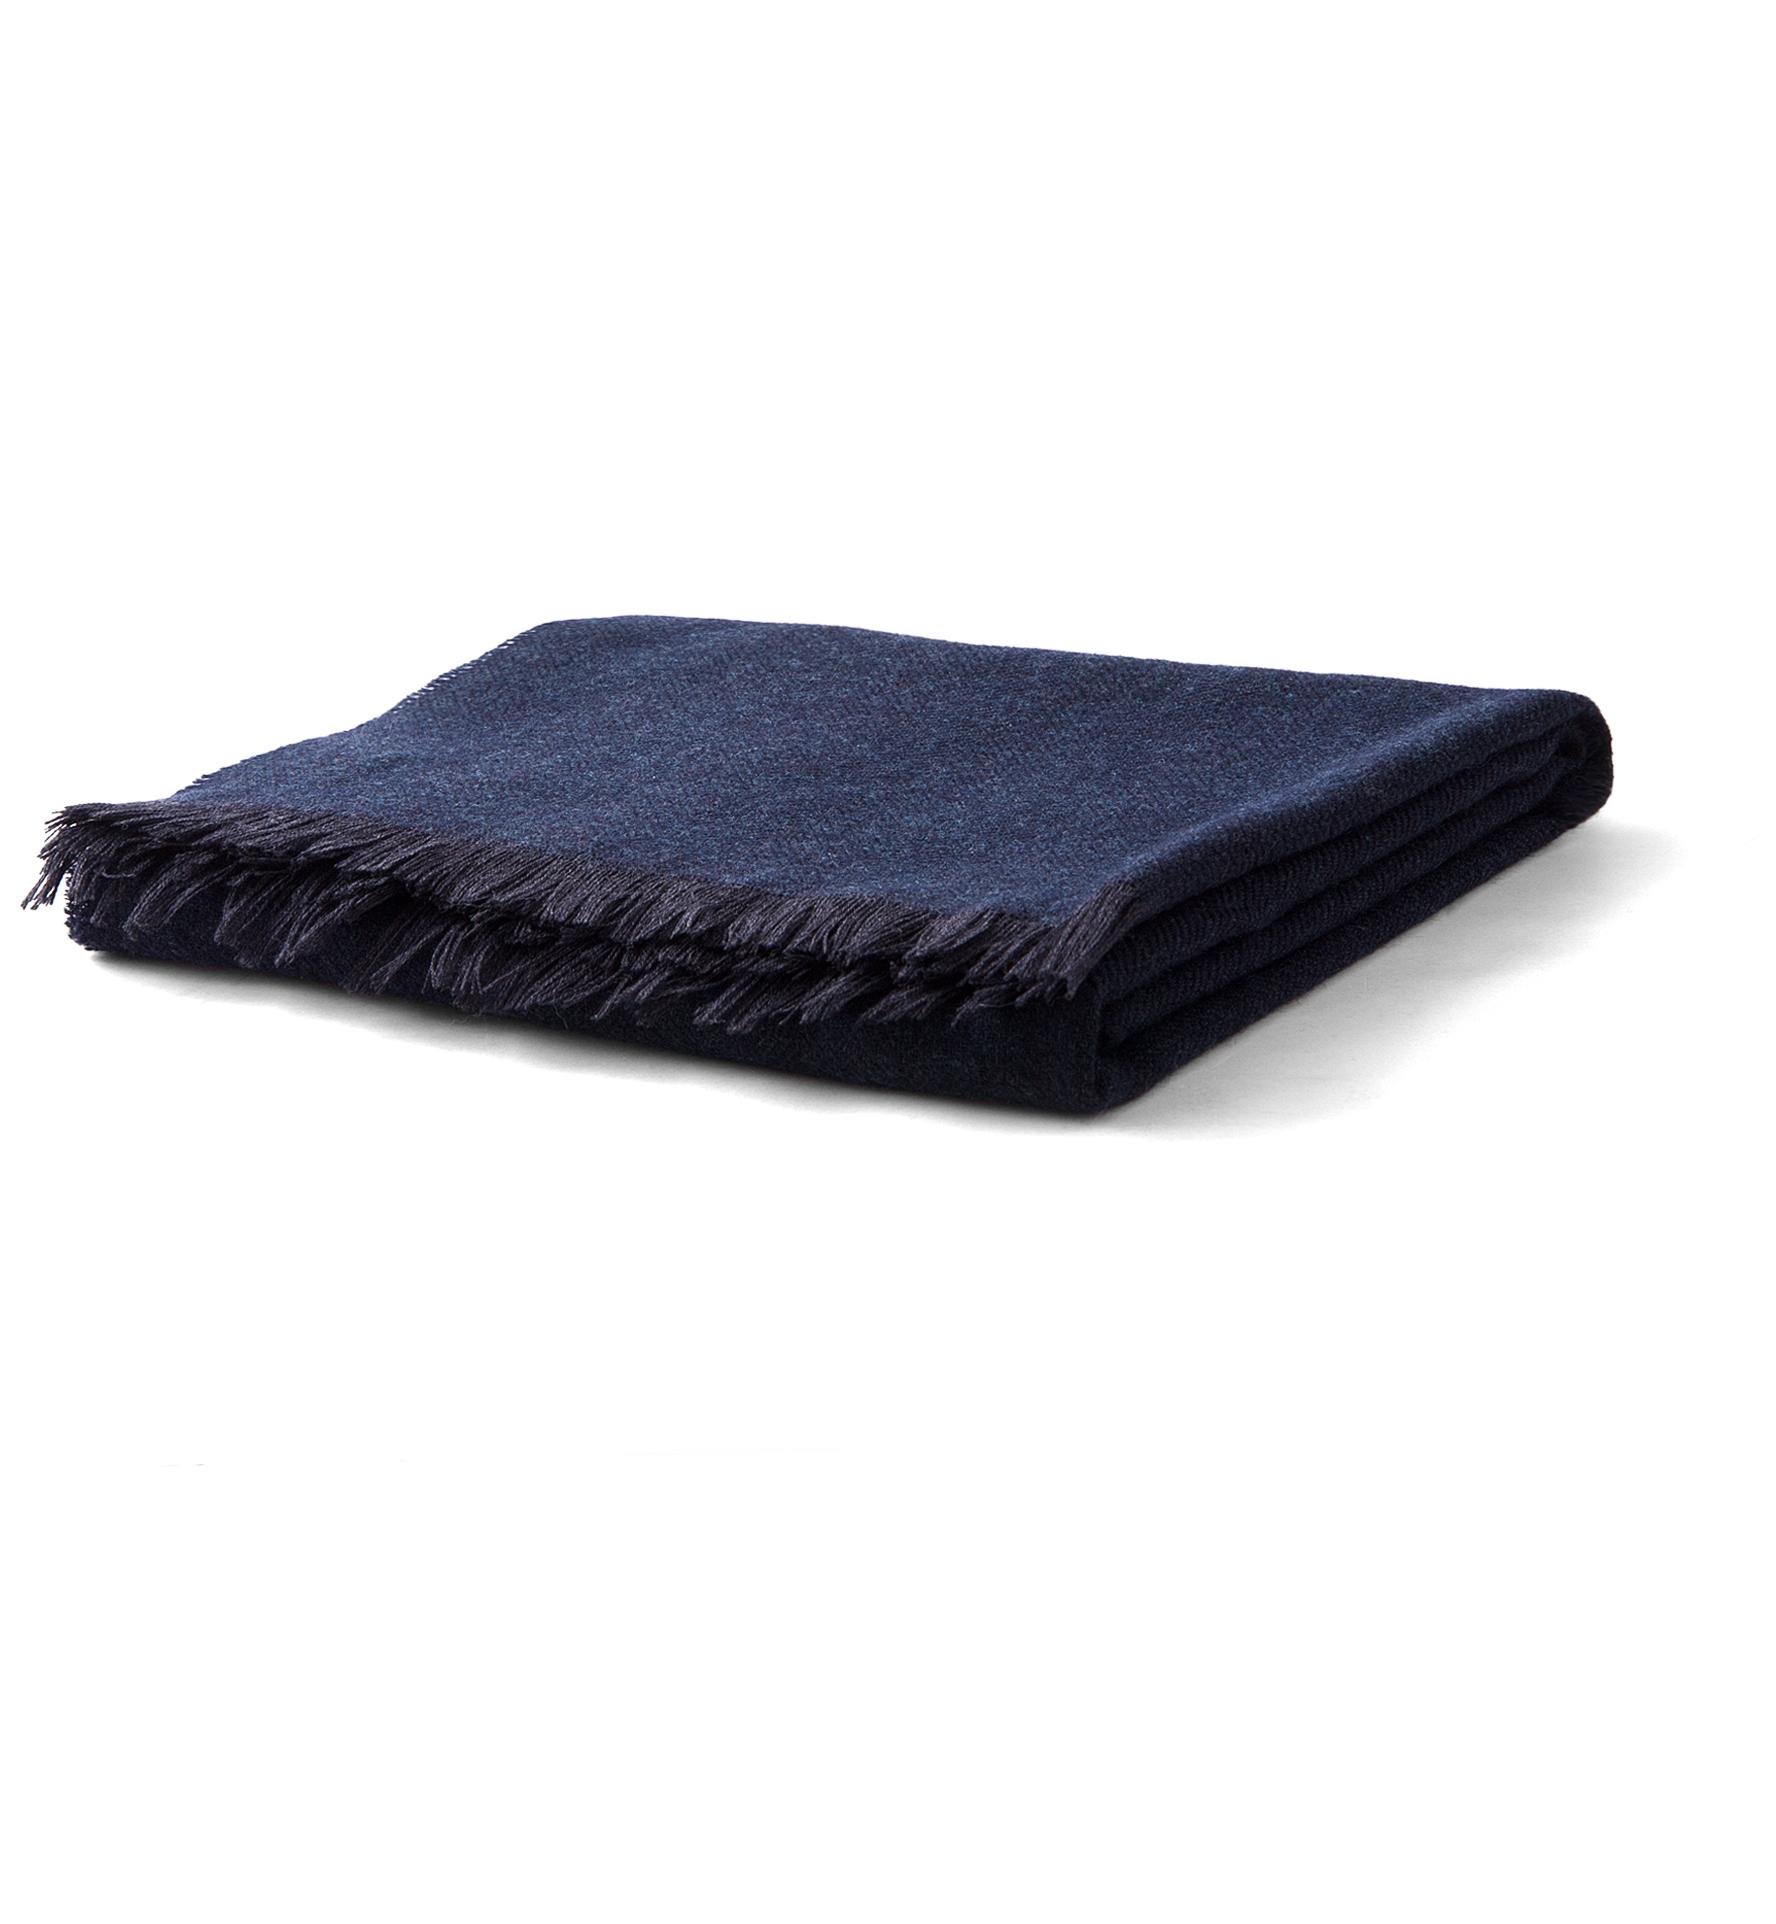 Zoom Image of Navy Herringbone Wool Cashmere Scarf